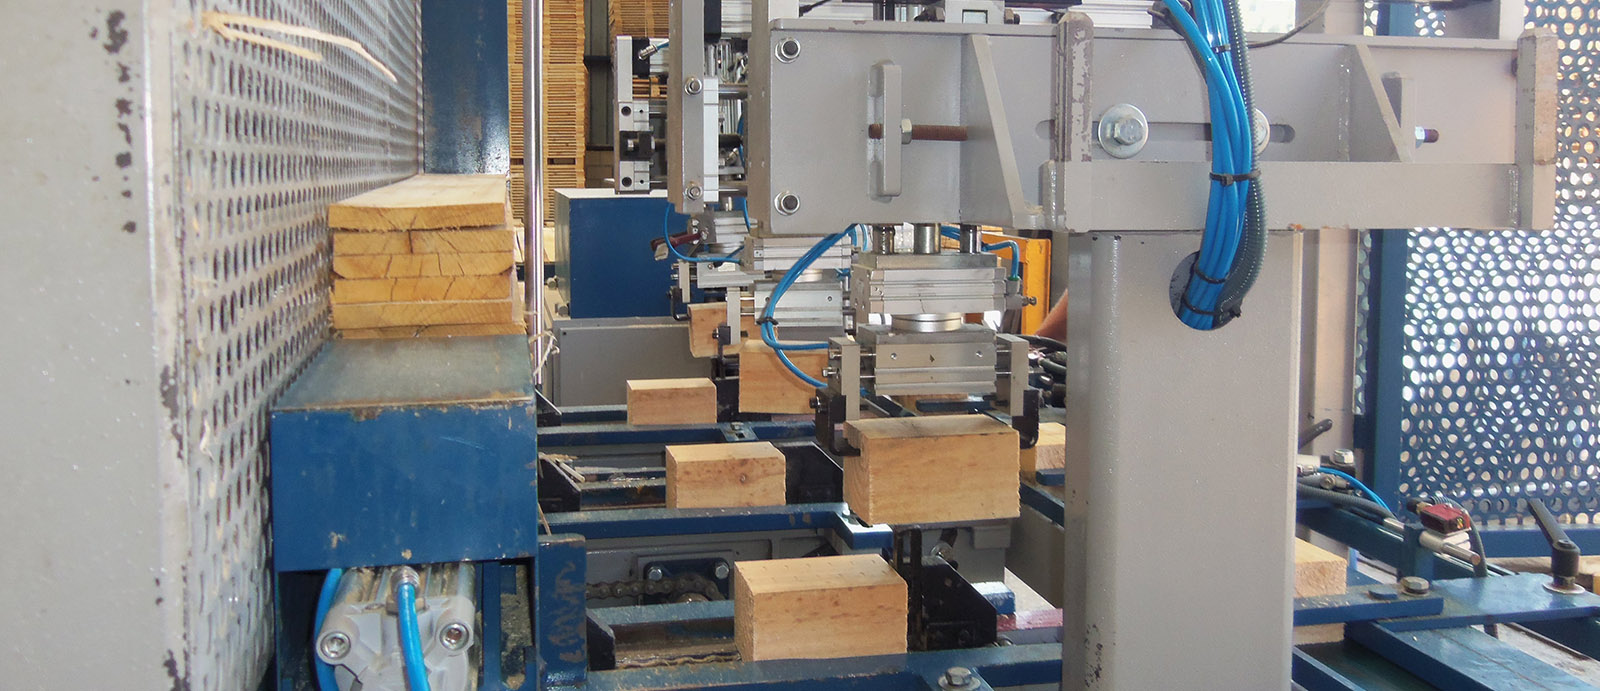 Orue. Fábrica de palets de madera